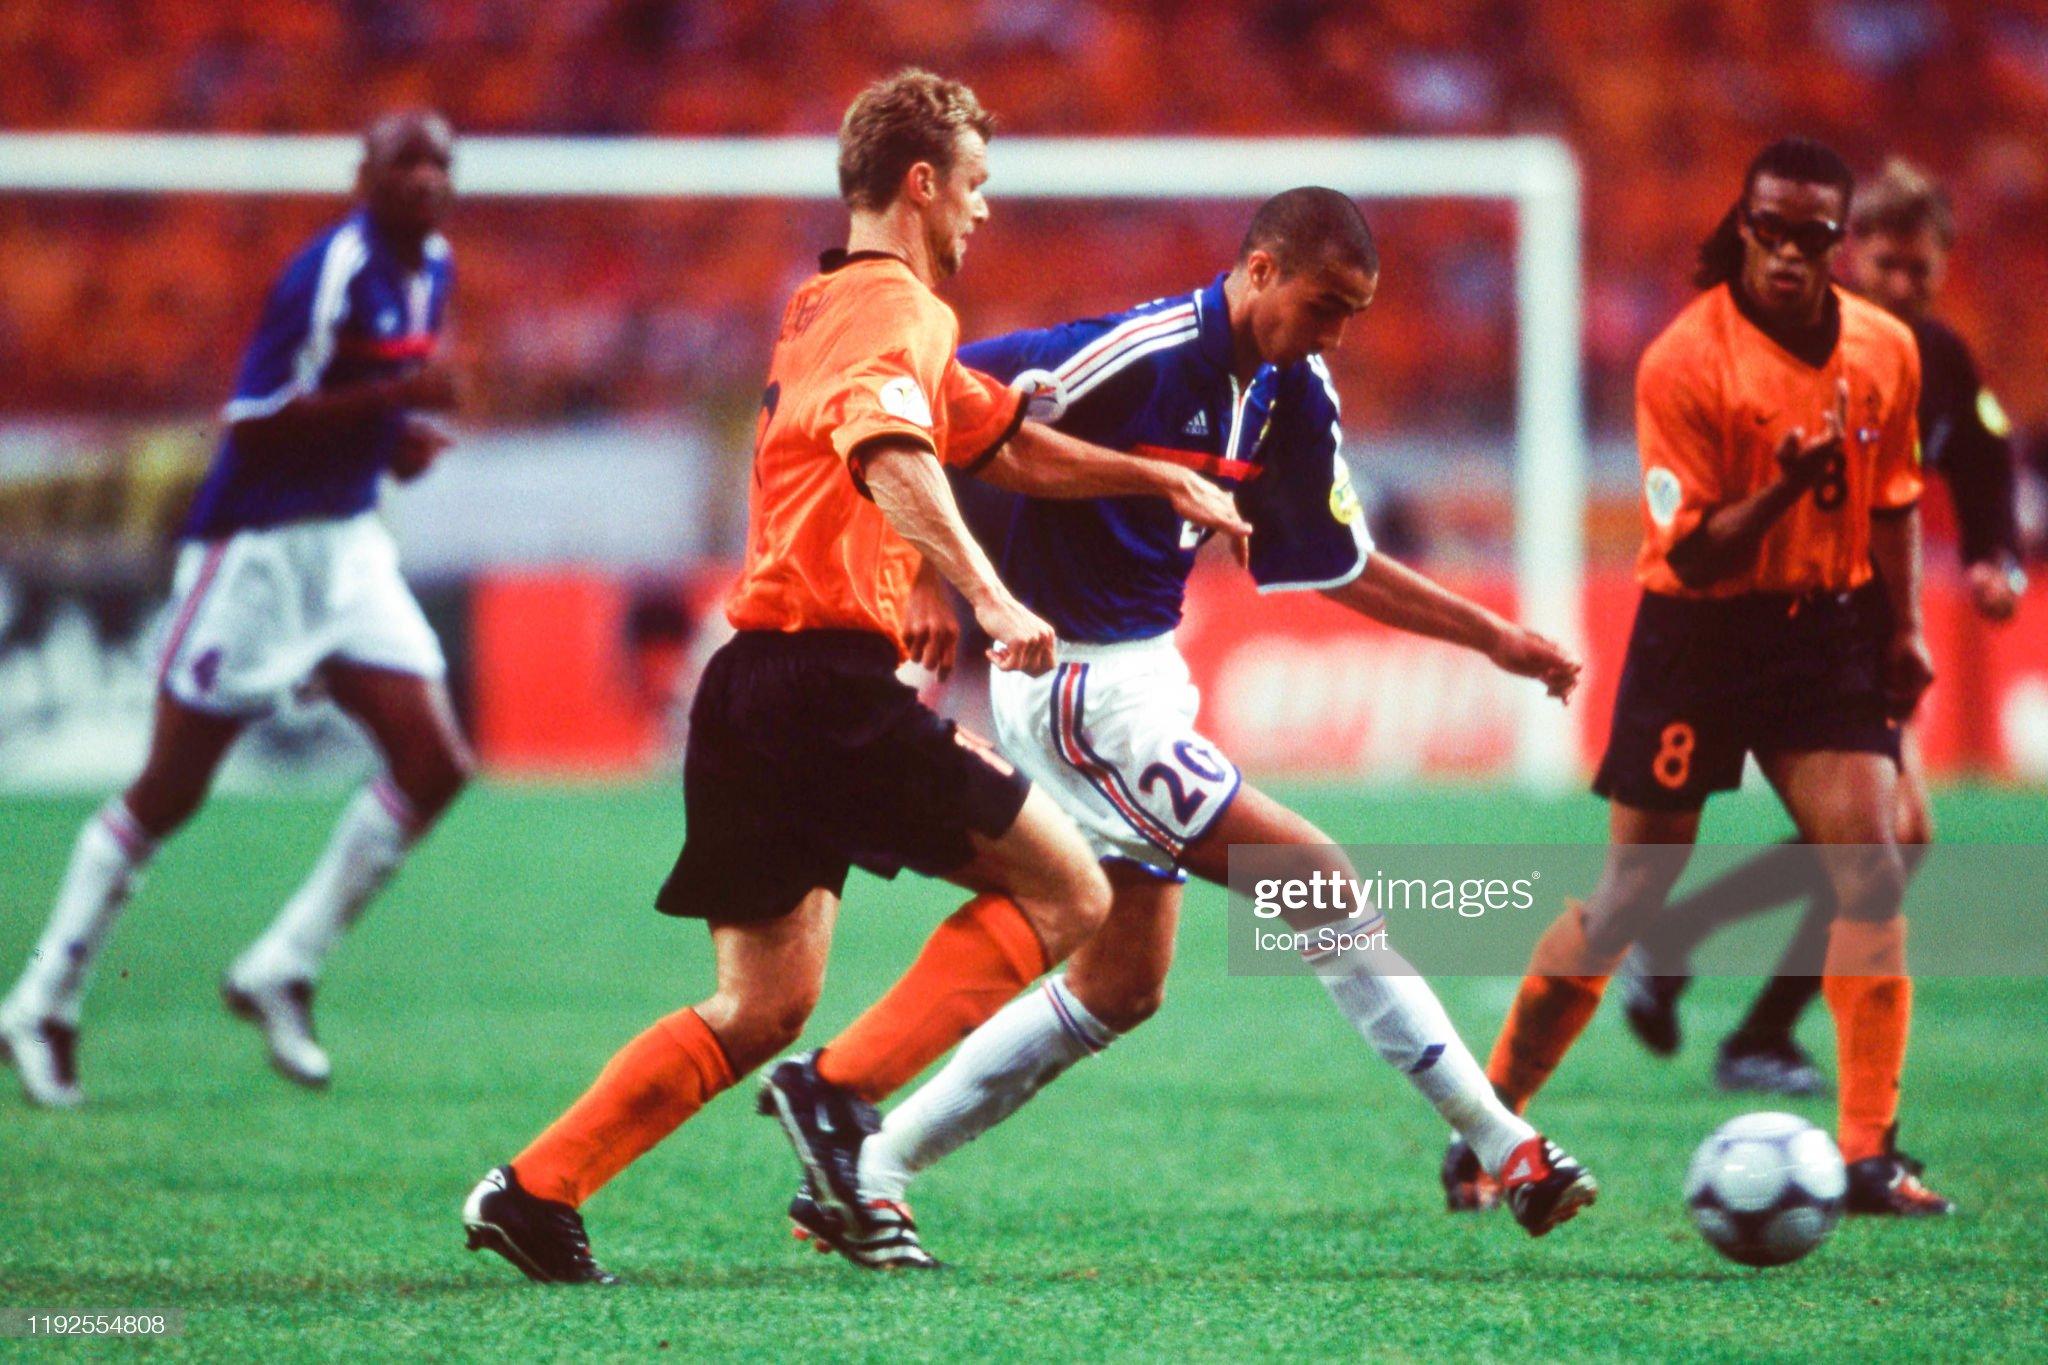 France v Netherlands - European Championship 2000 : News Photo